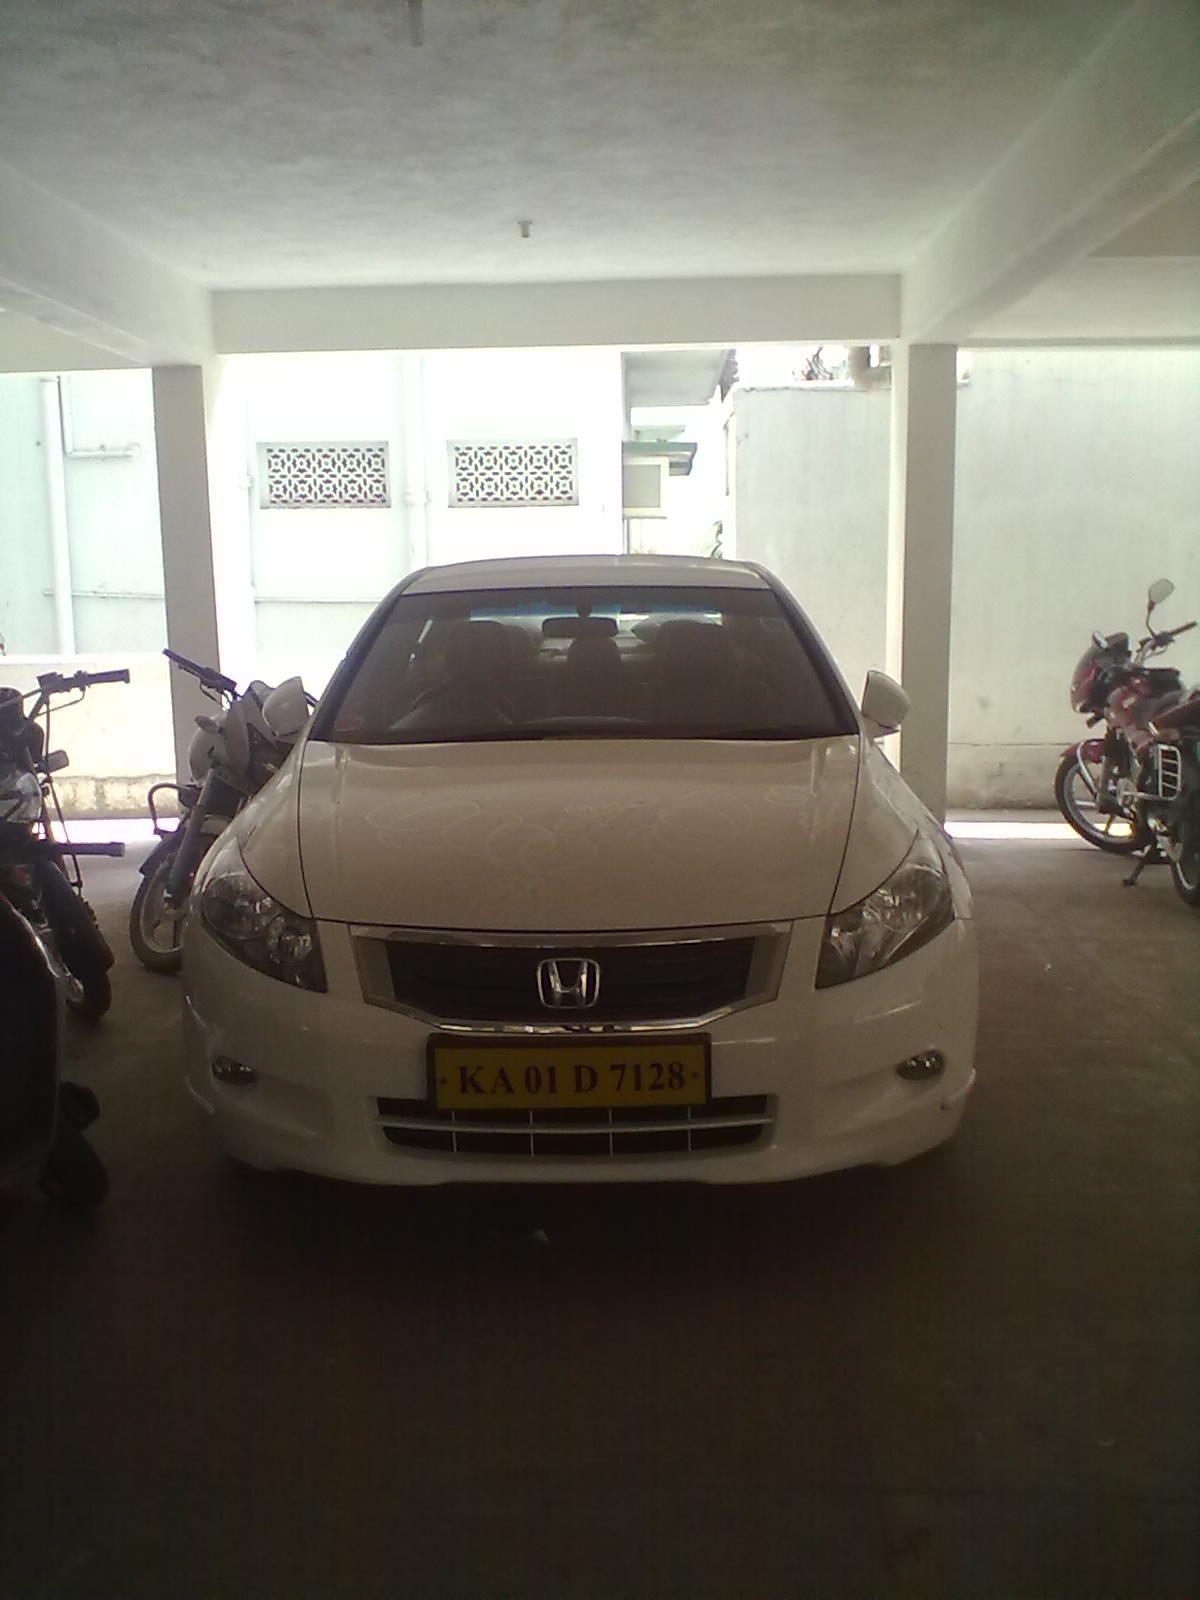 Car Rental Agency Hire Cab Rental Car Rental Rates Bangalore Http Bangalorecabhire Com Tavera Html S G Re Car Rental Coupons Car Rental Cheap Car Rental